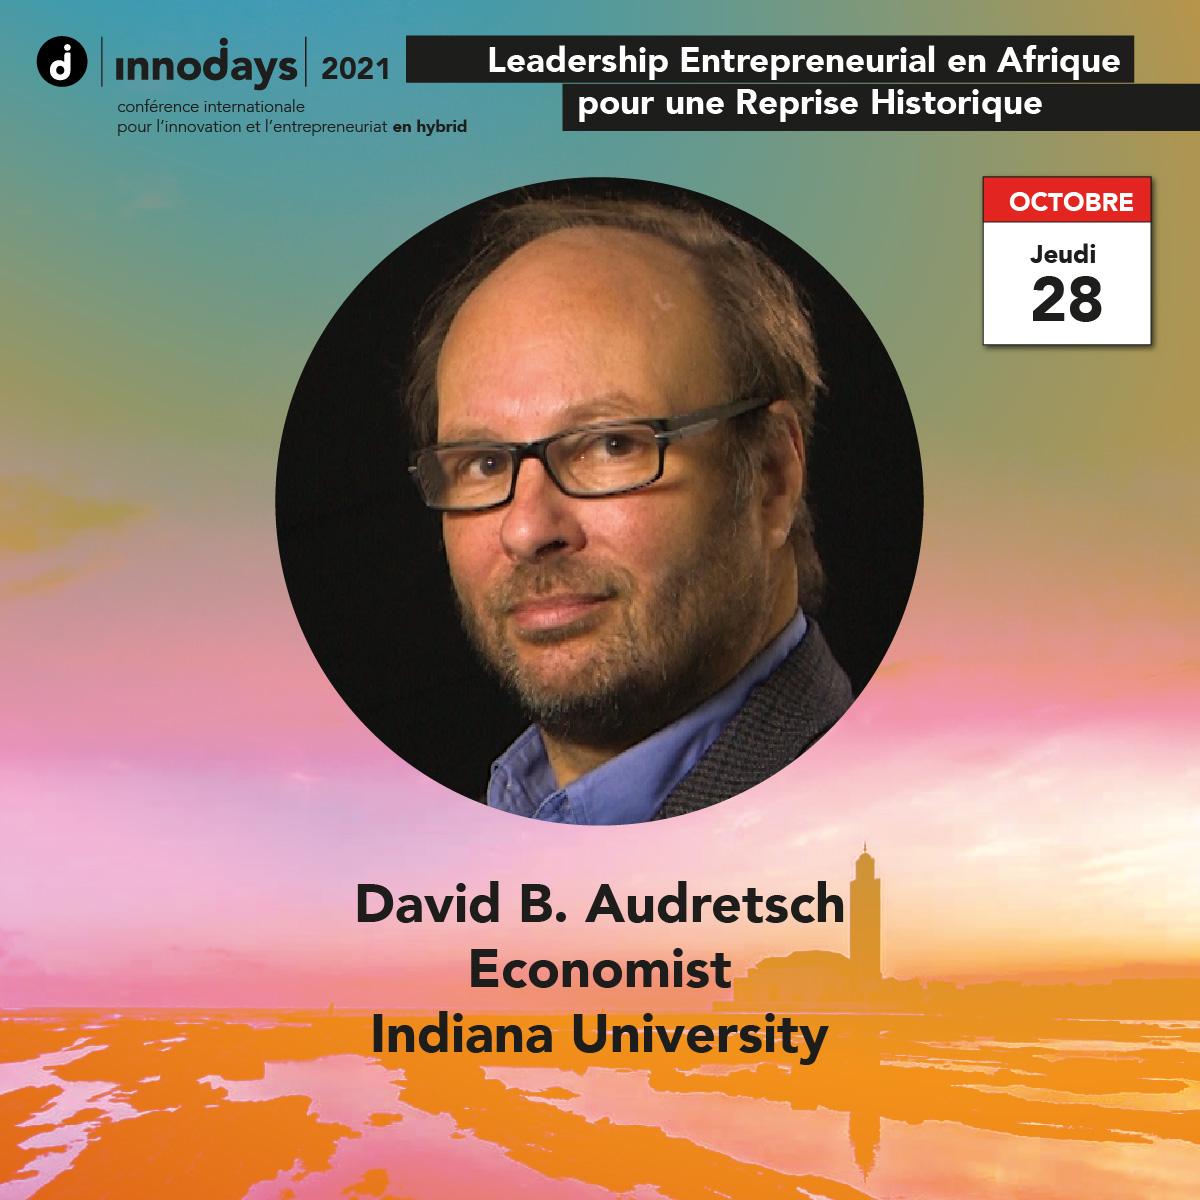 David B. Audretsch - Economist - Indiana University